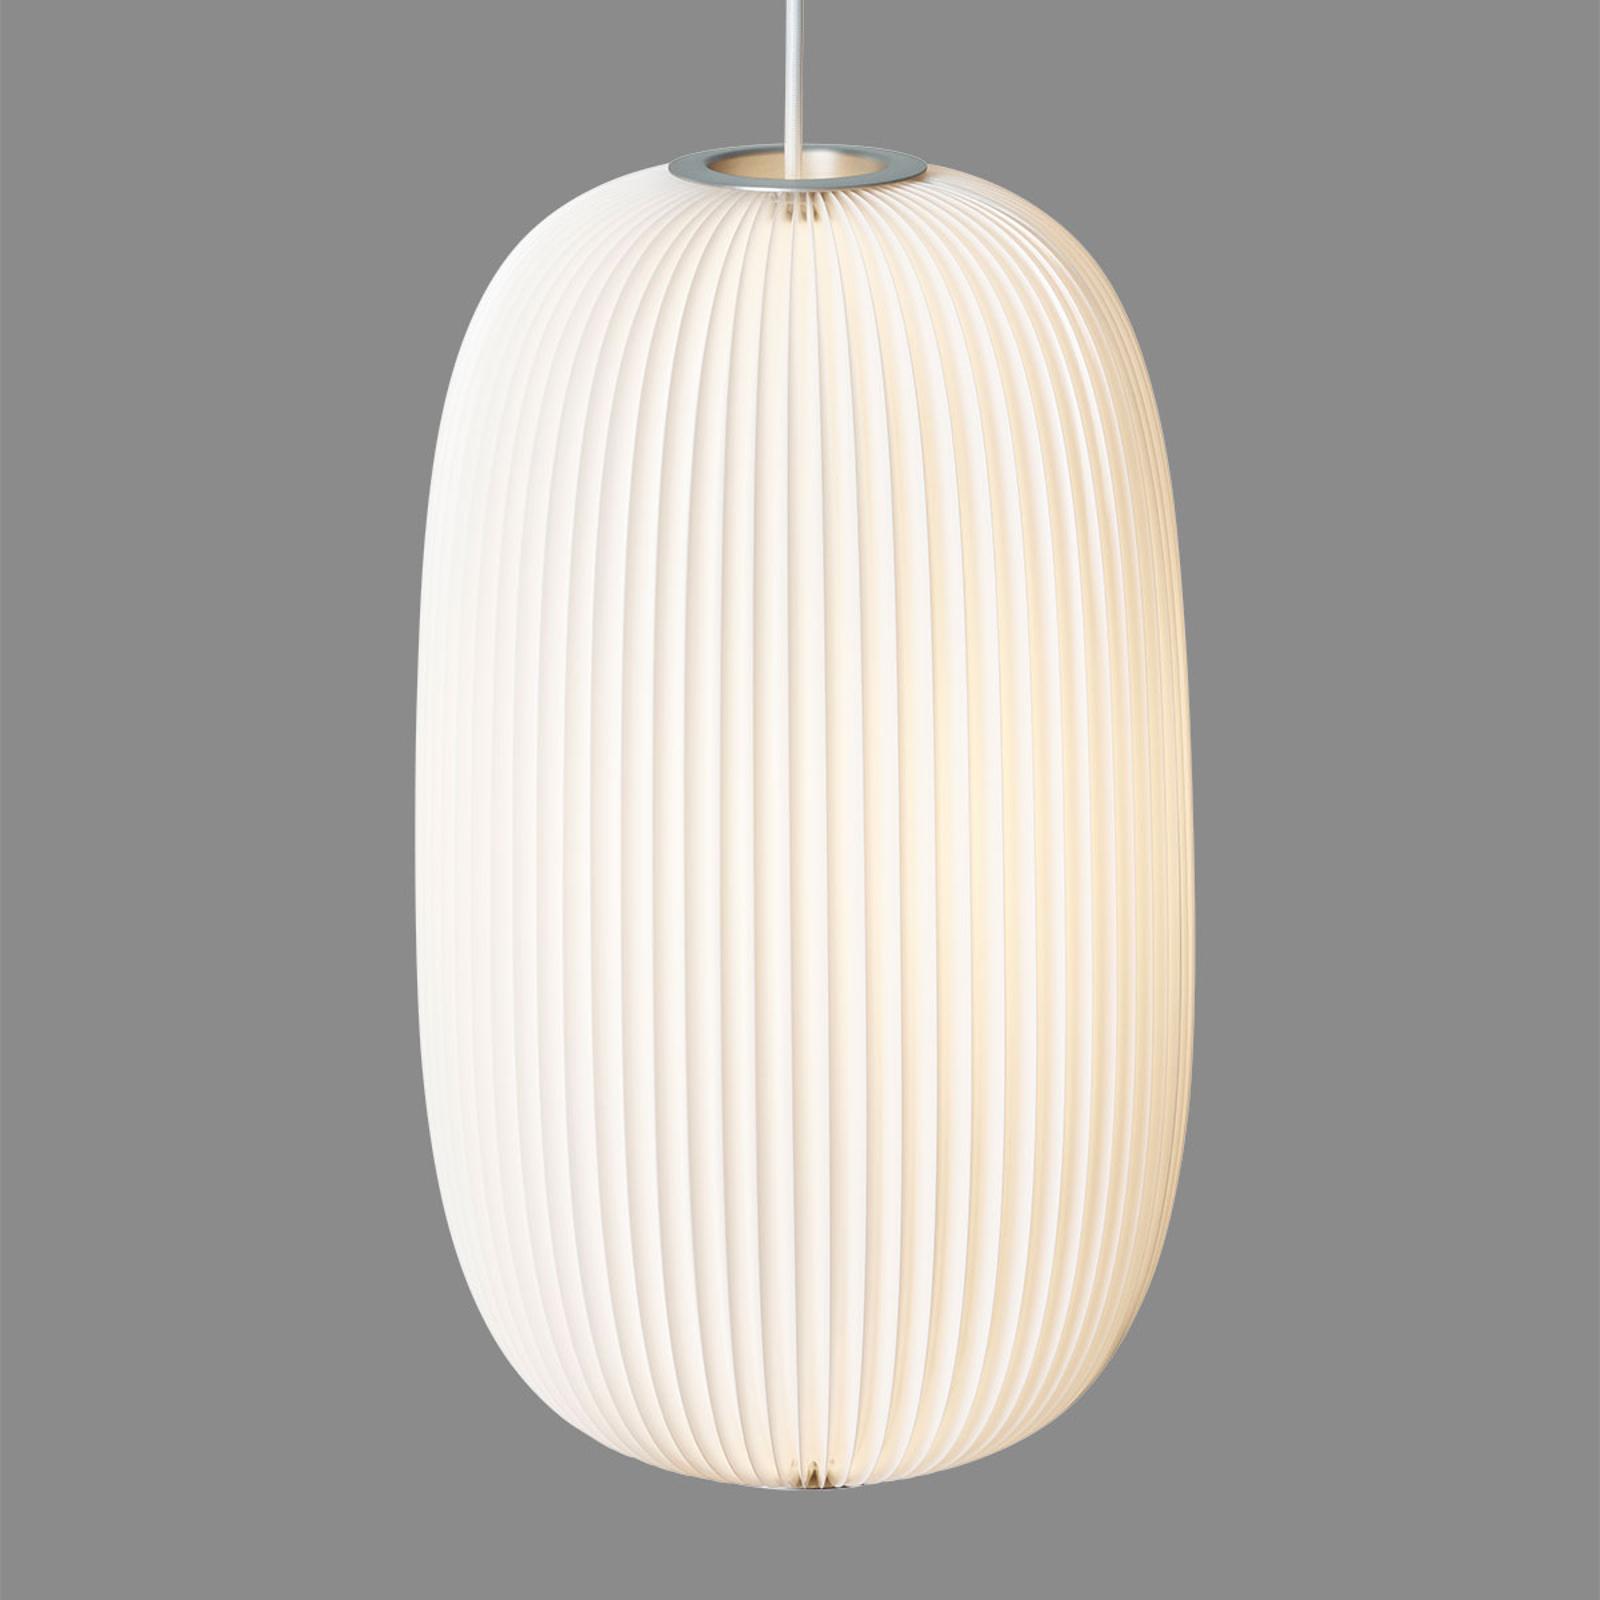 Le KLINT Lamella 2 - design-hanglamp, alu